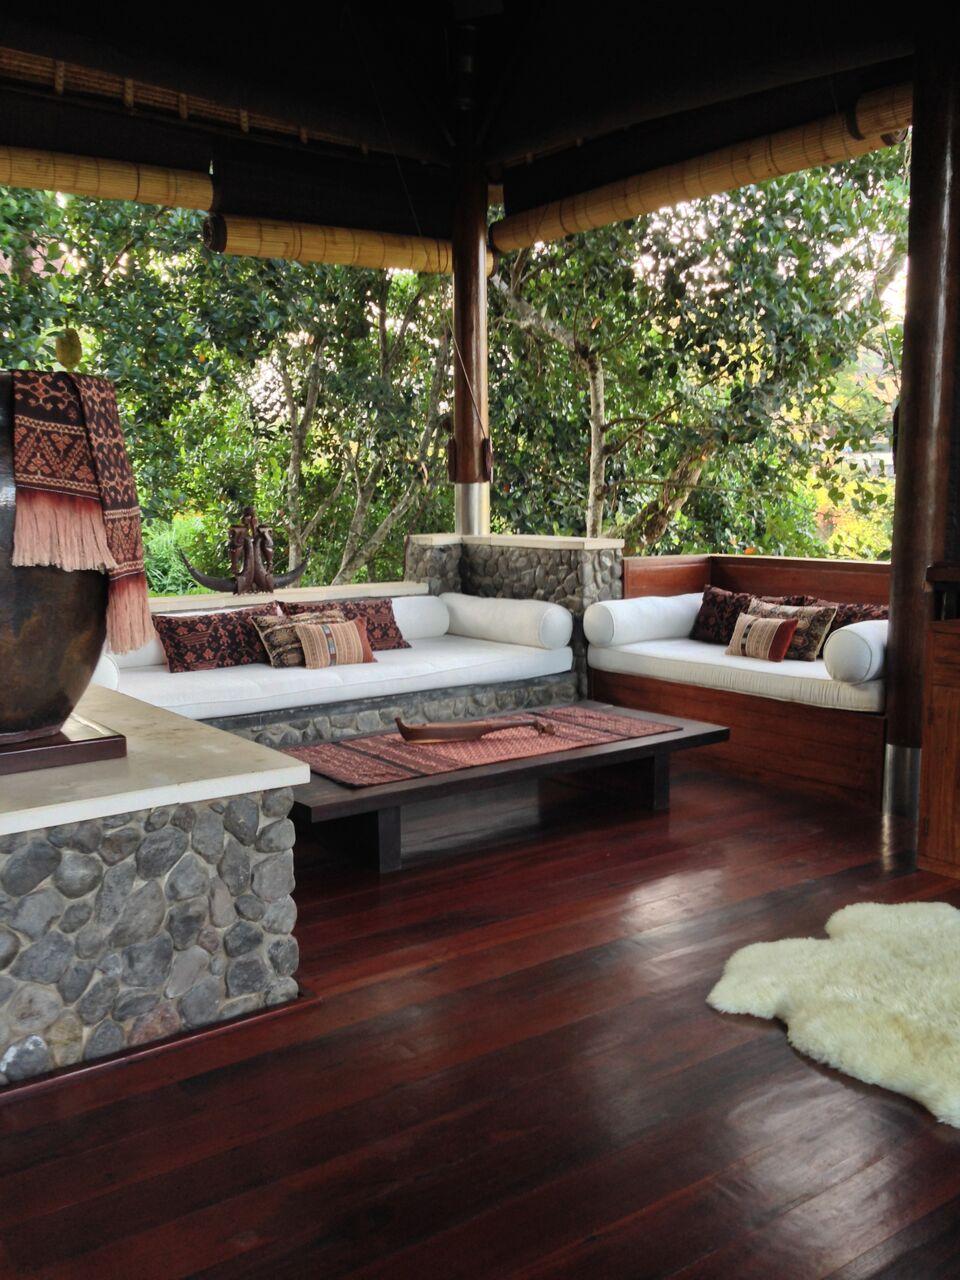 Natural light, air flow, reclaim hardwood flooring…eco-friendly 101!